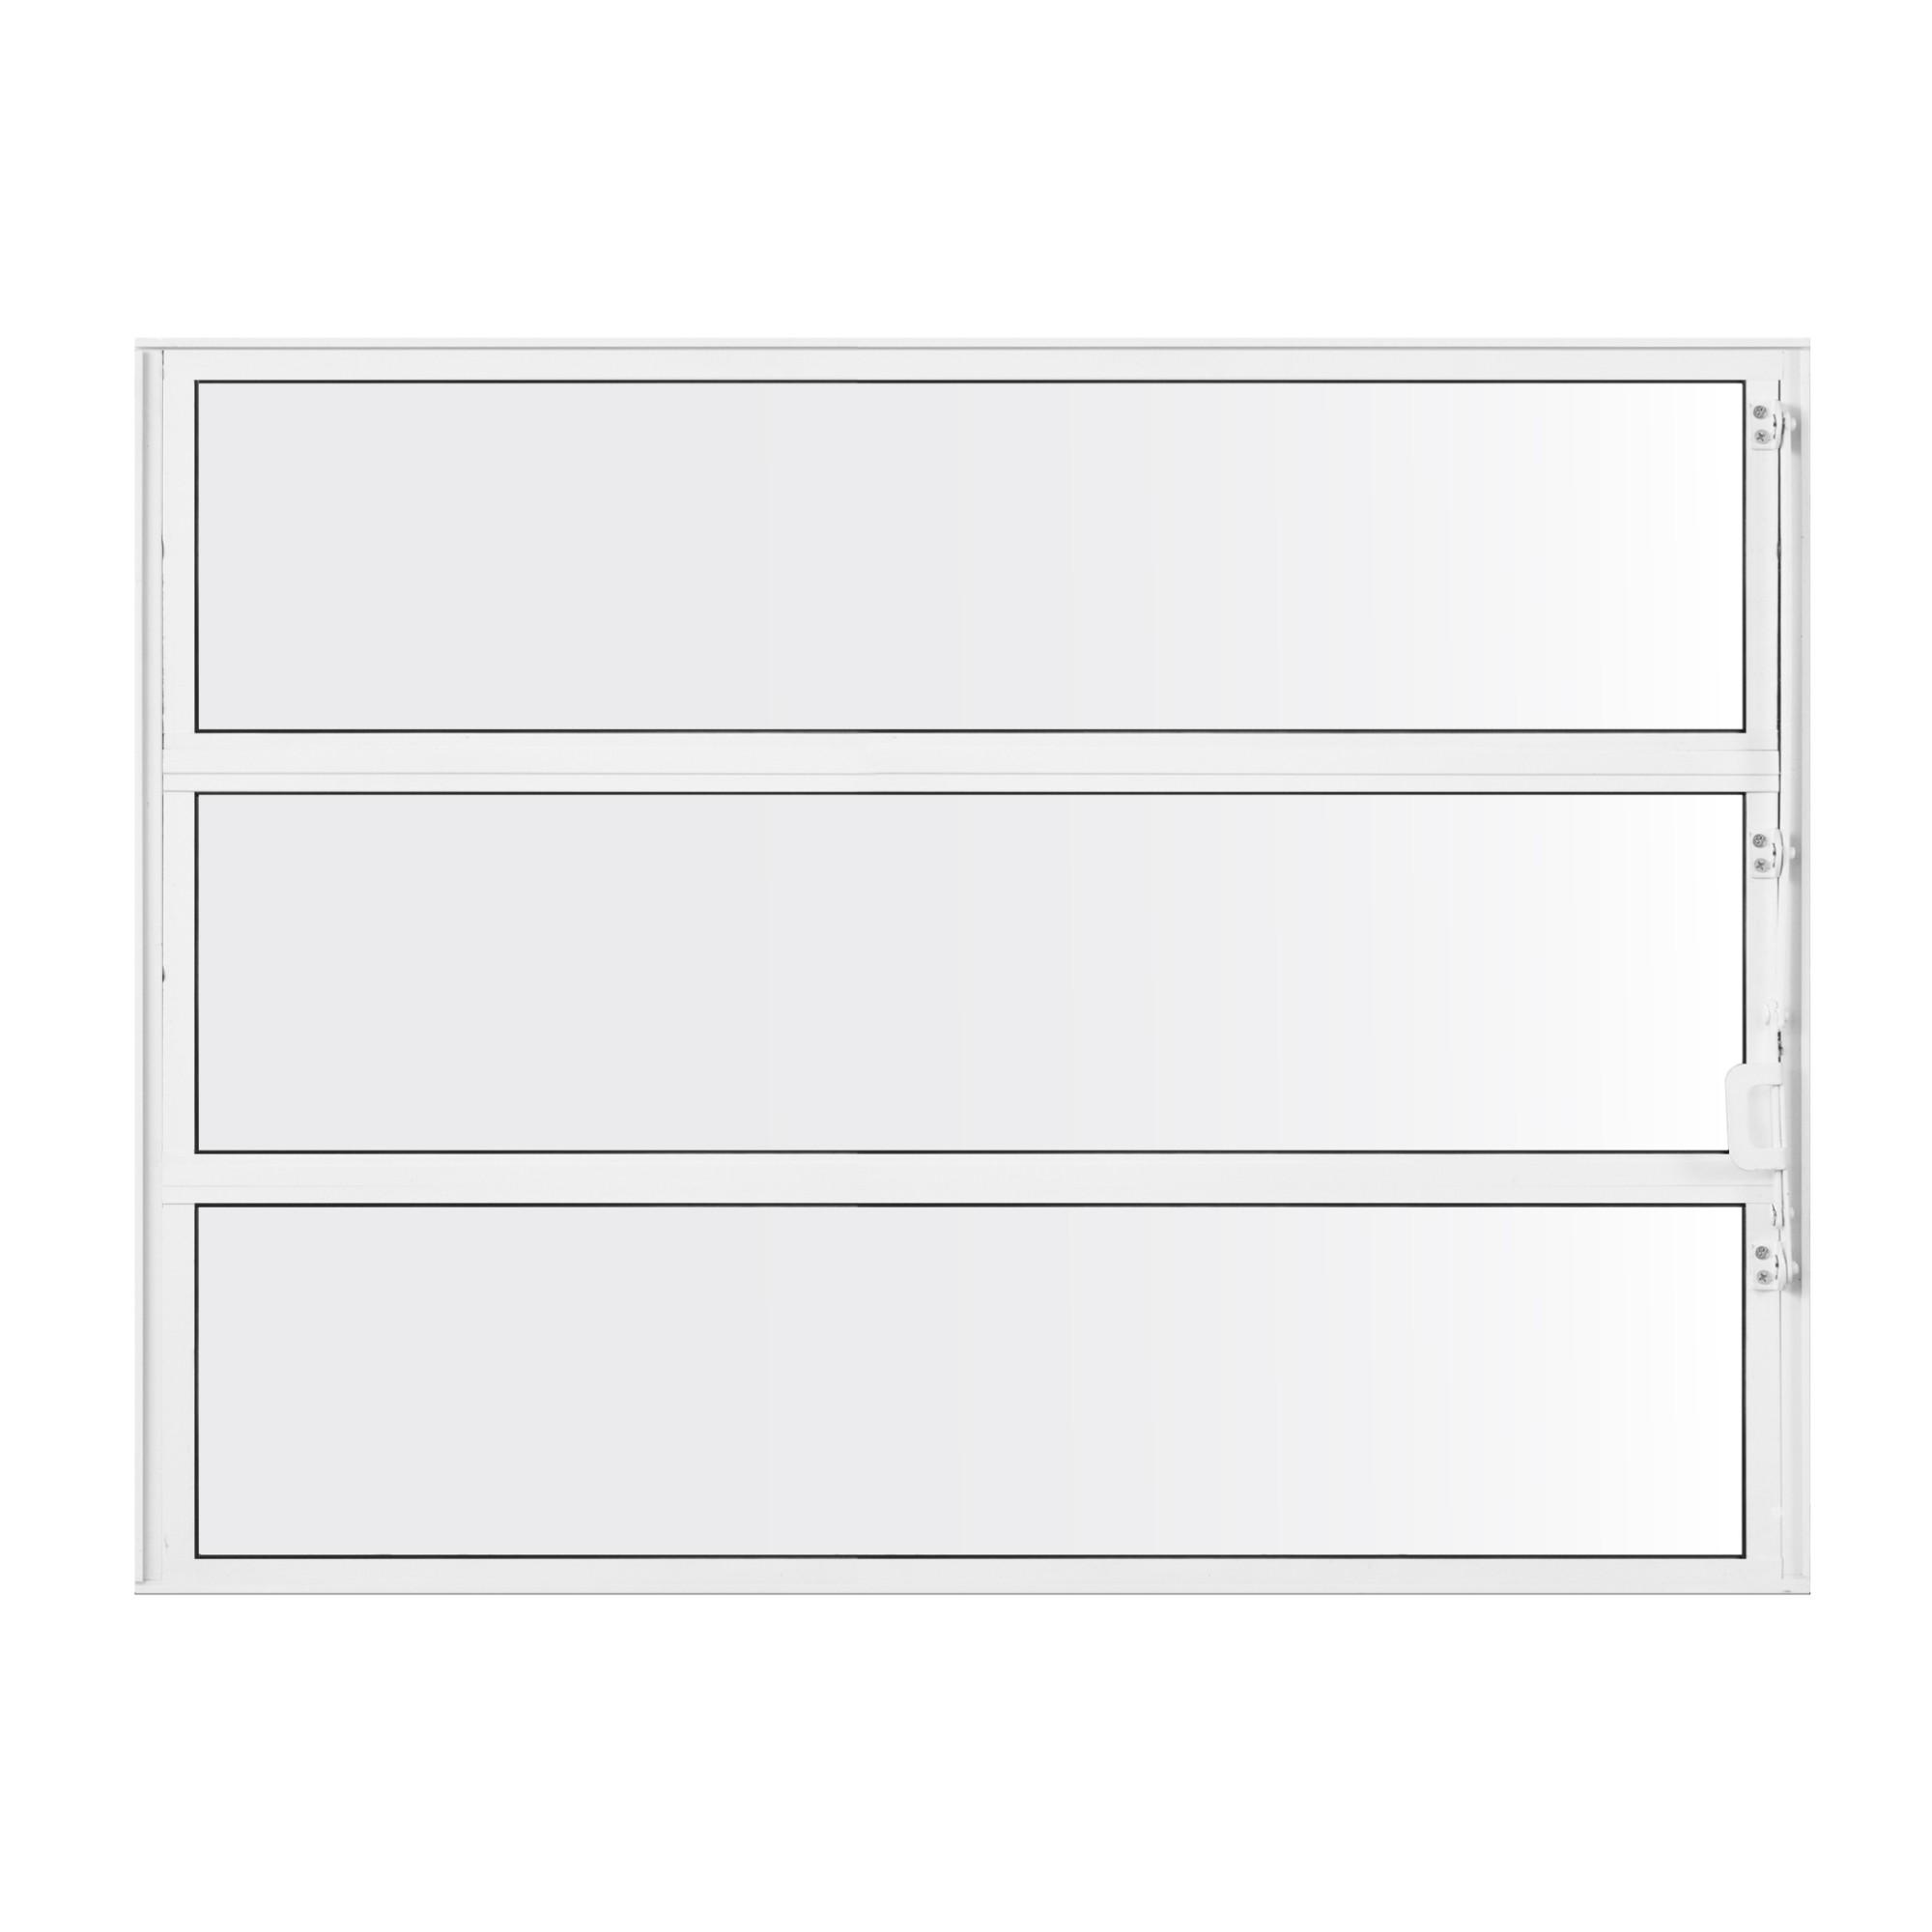 Janela de Abrir Basculante de Aluminio Vidro Liso 60x80 cm Branco - Metalflex Aluvid